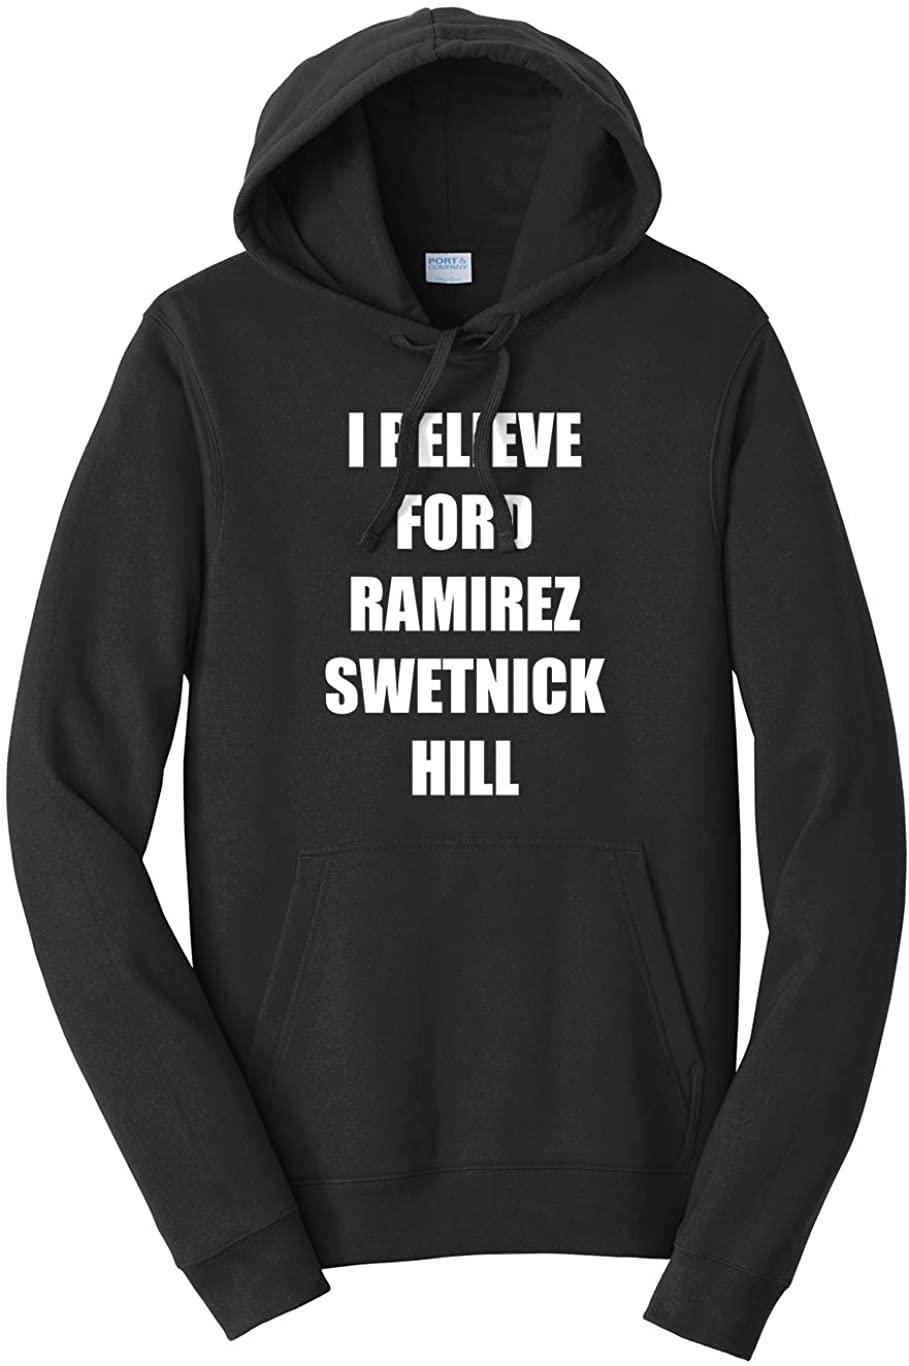 Tenacitee Unisex I Believe Ford Ramirez Swetnick Hill Hooded Sweatshirt